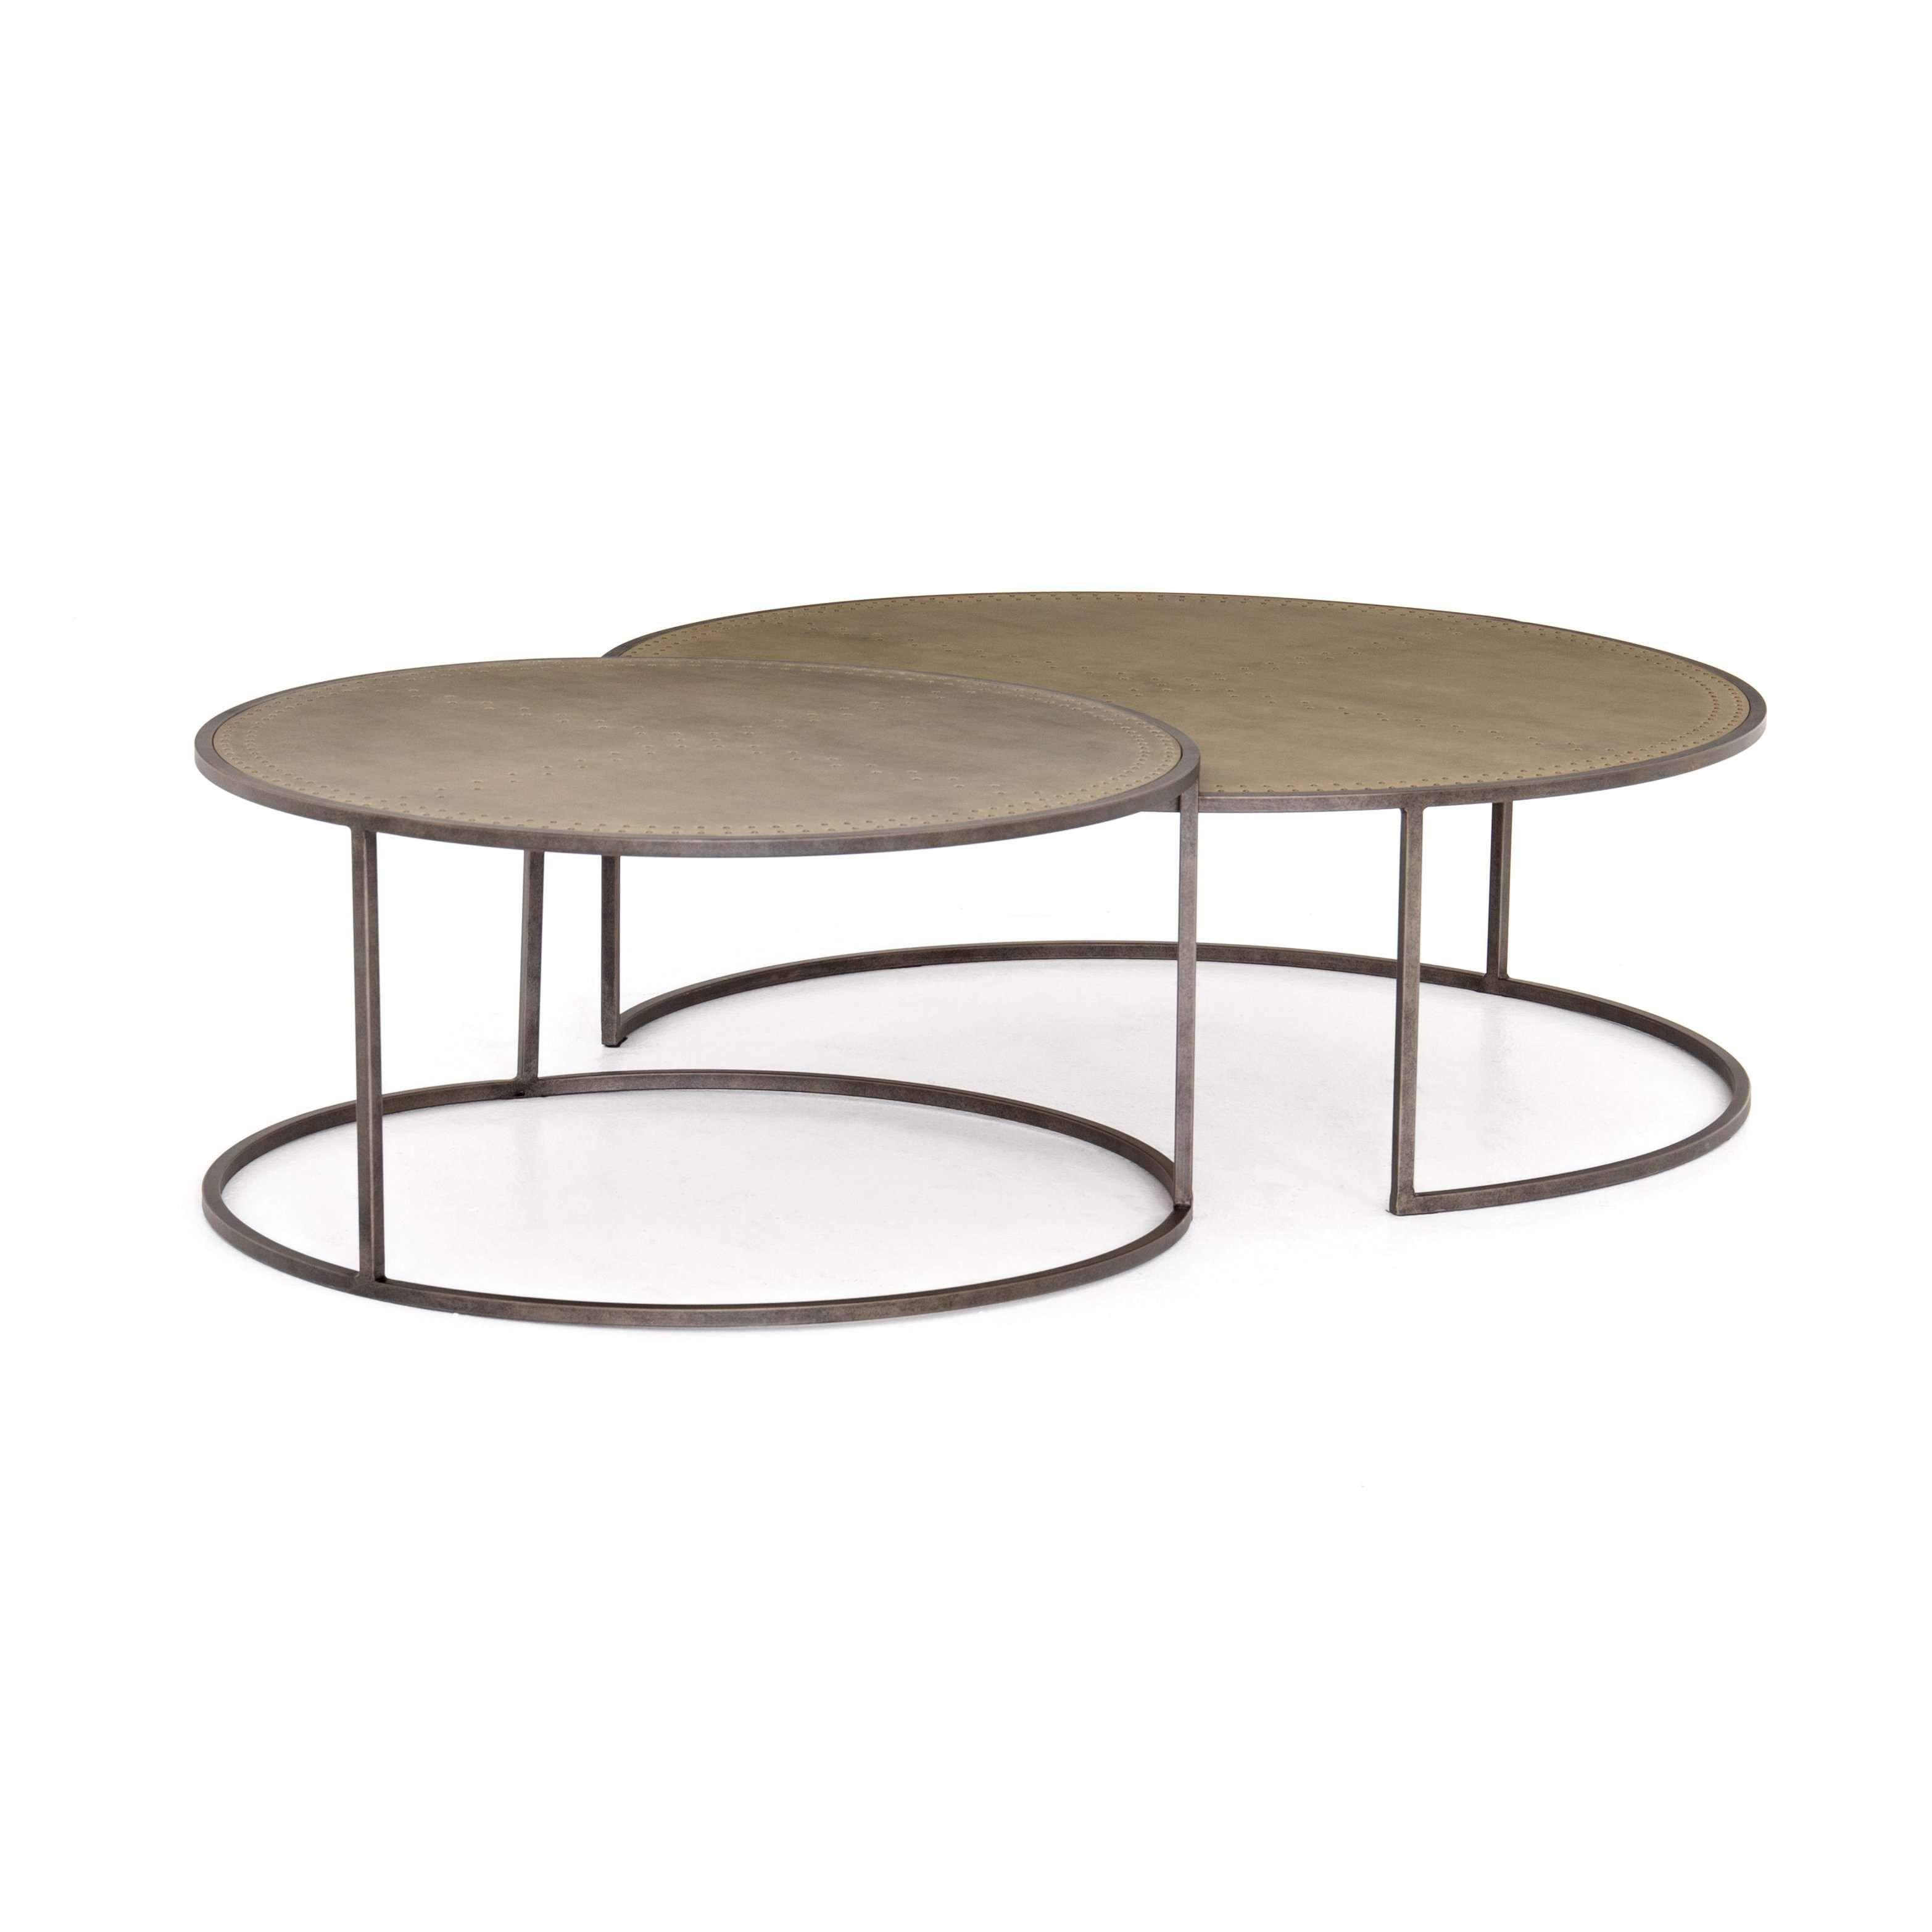 Catalina Nesting Coffee Table Galvanized France Son Nesting Coffee Tables Coffee Table Zinc Table Top